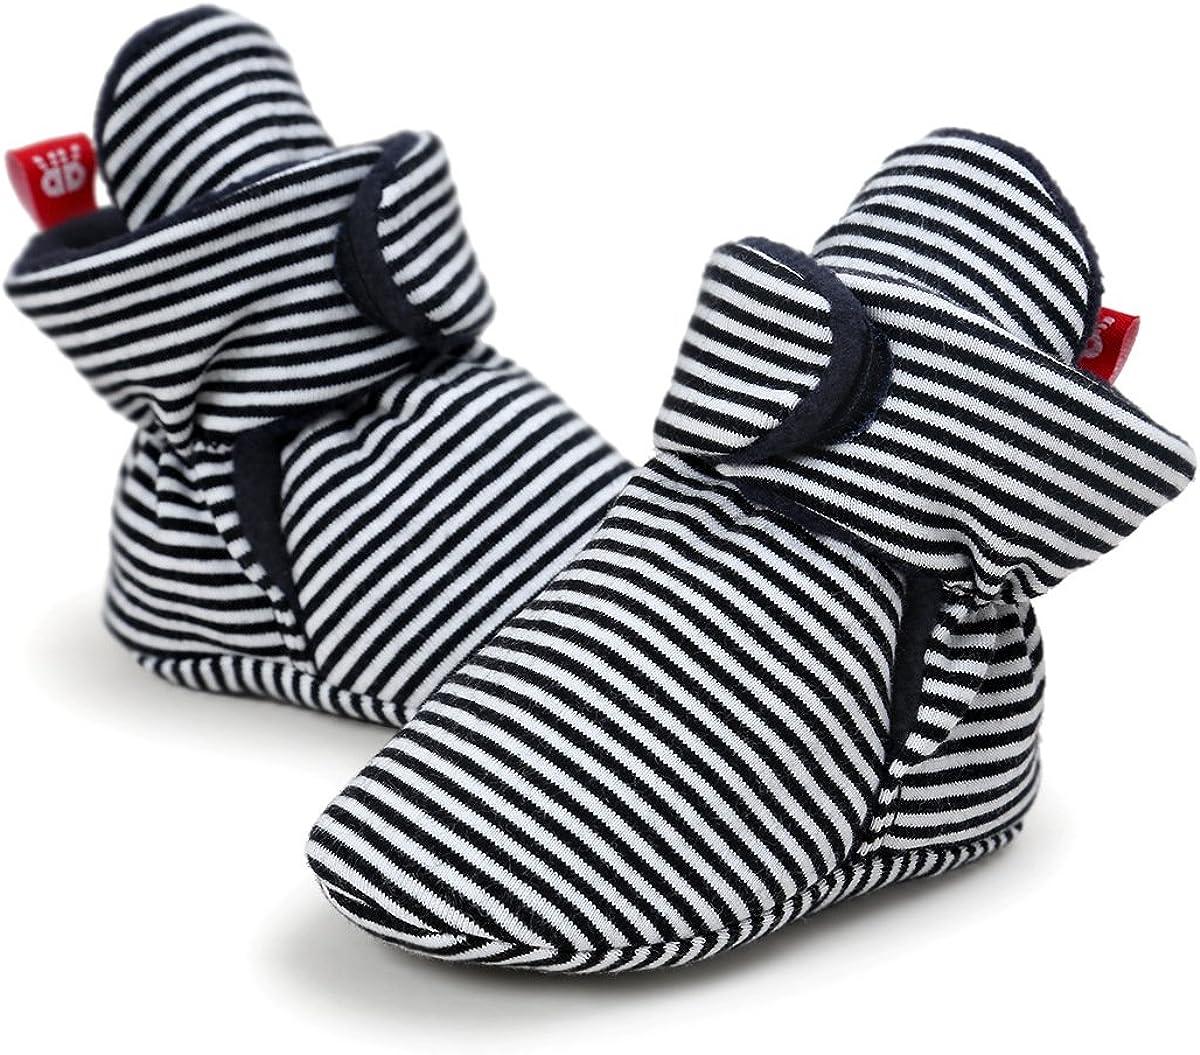 SININIDR Newborn Jumpsuit Infant Baby Girls Heathen Nation Long-Sleeve Bodysuit Playsuit Outfits Clothes Black